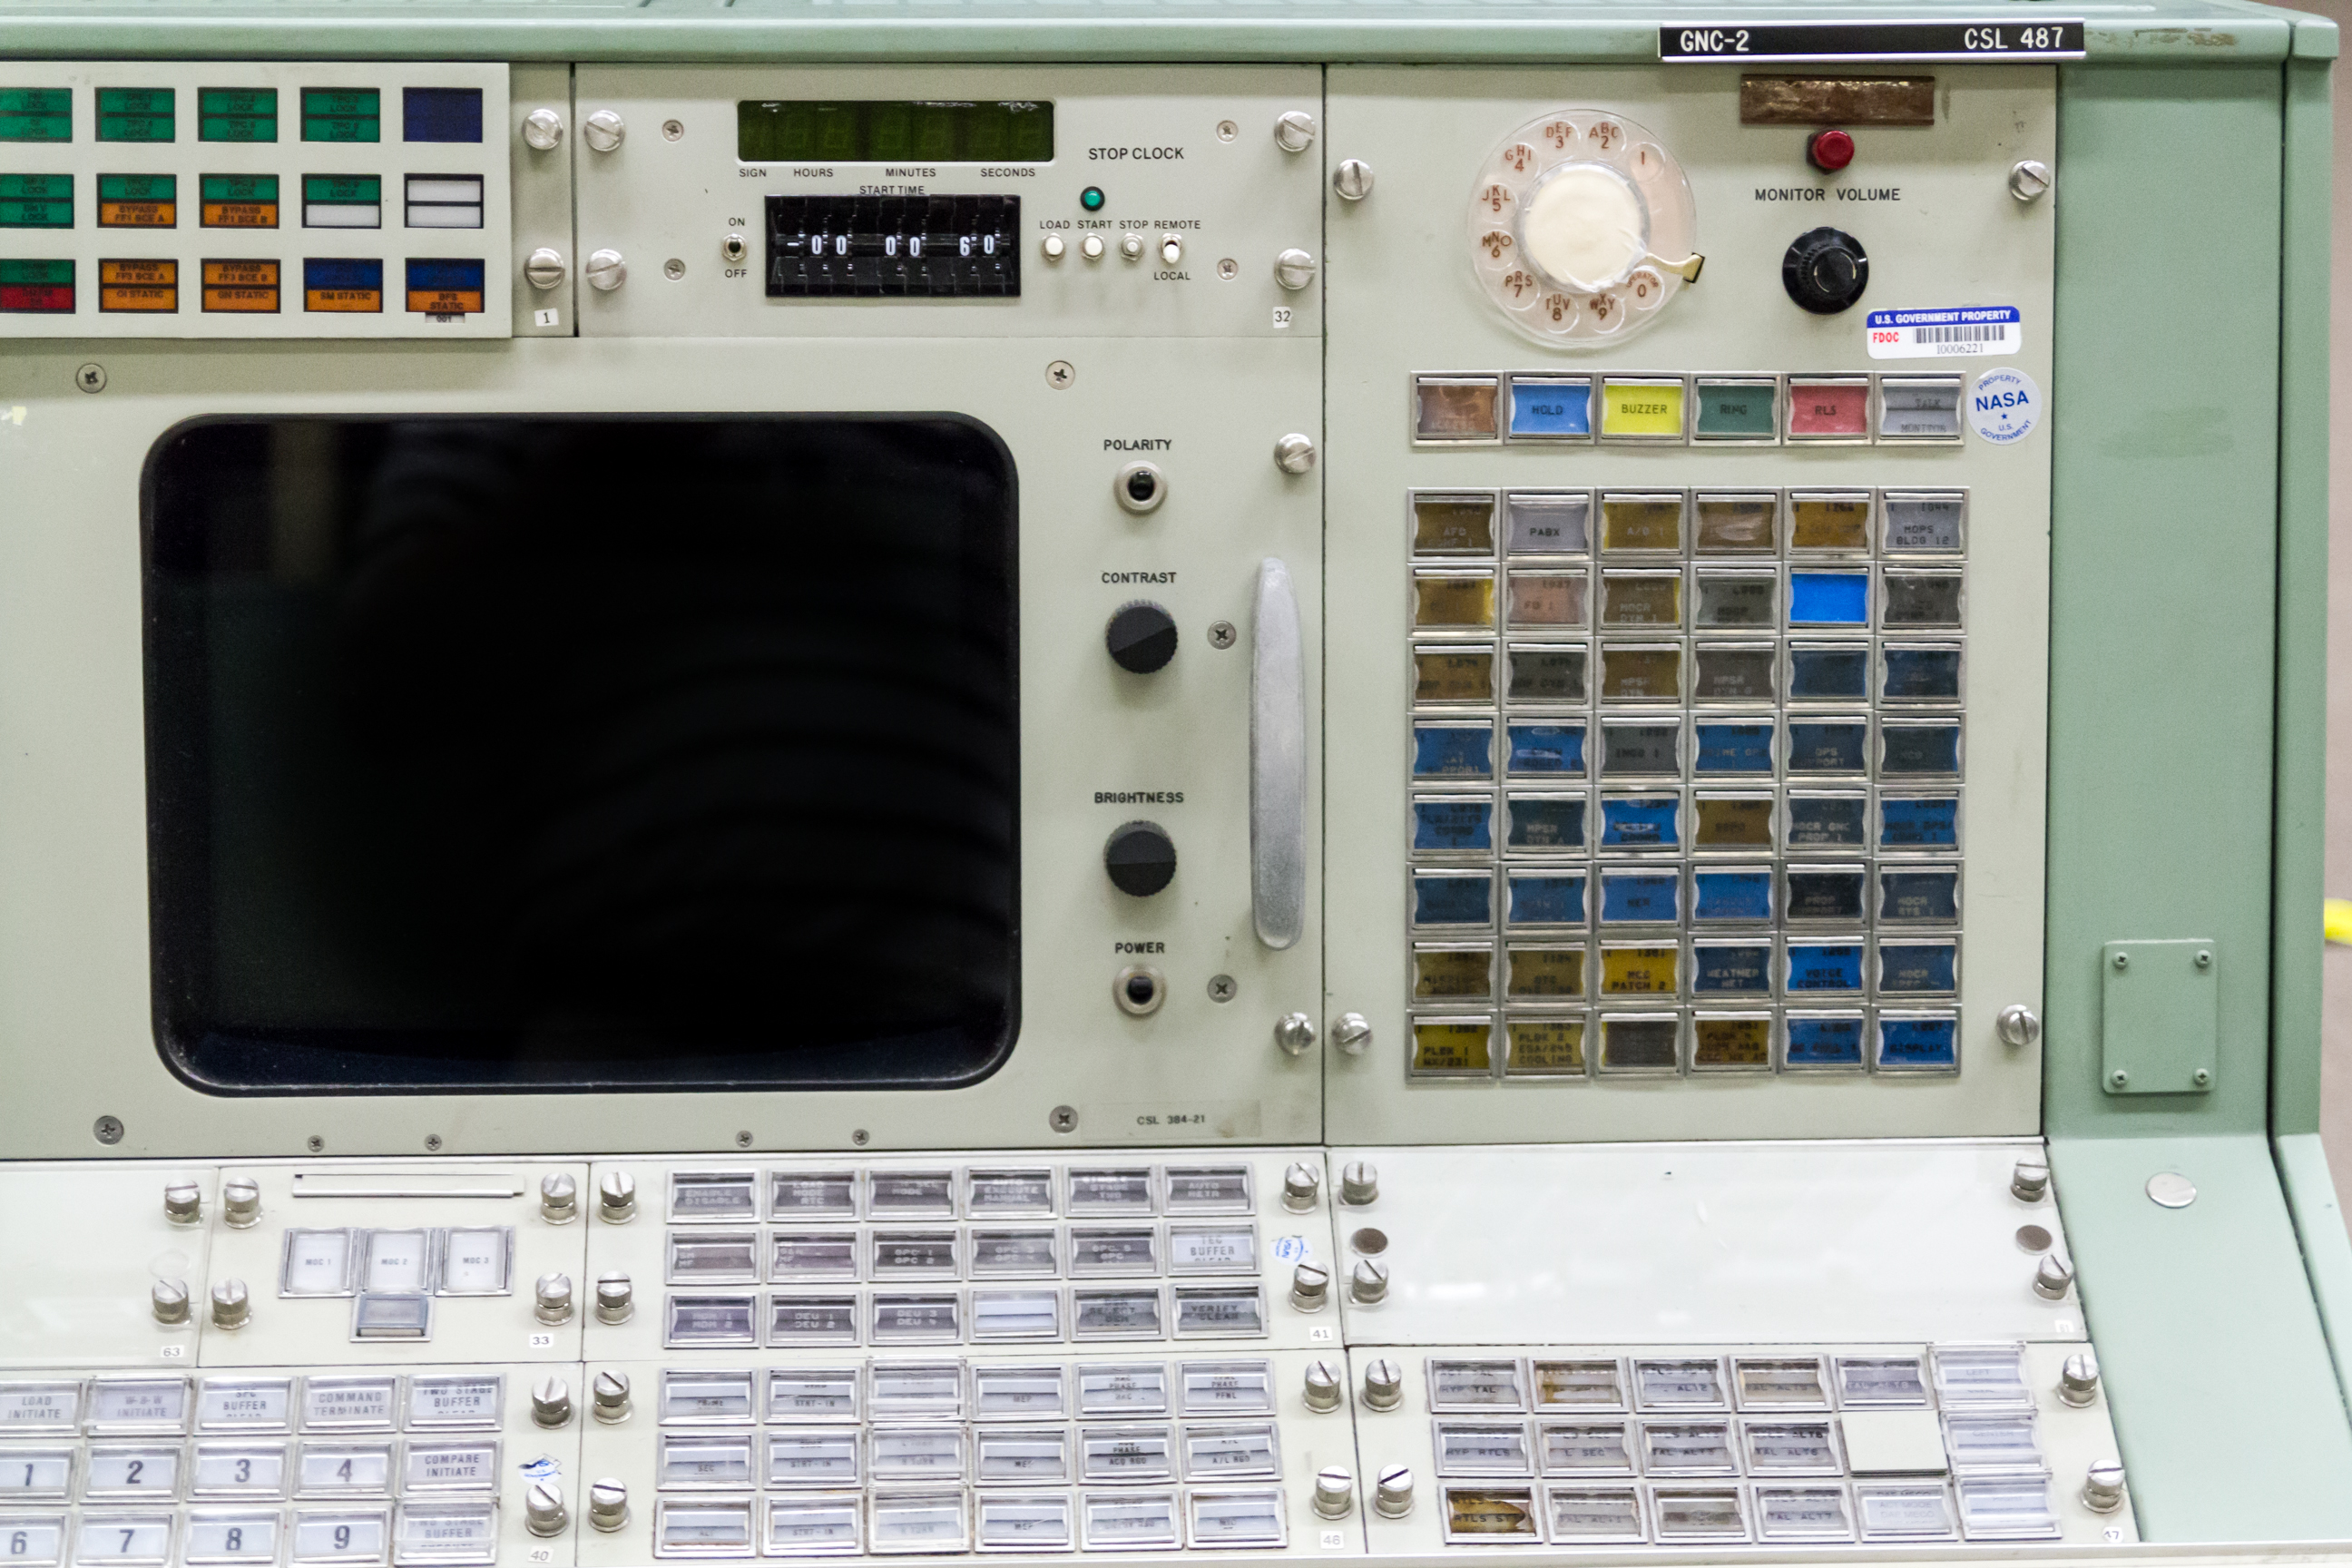 Motor control center - , the free encyclopedia